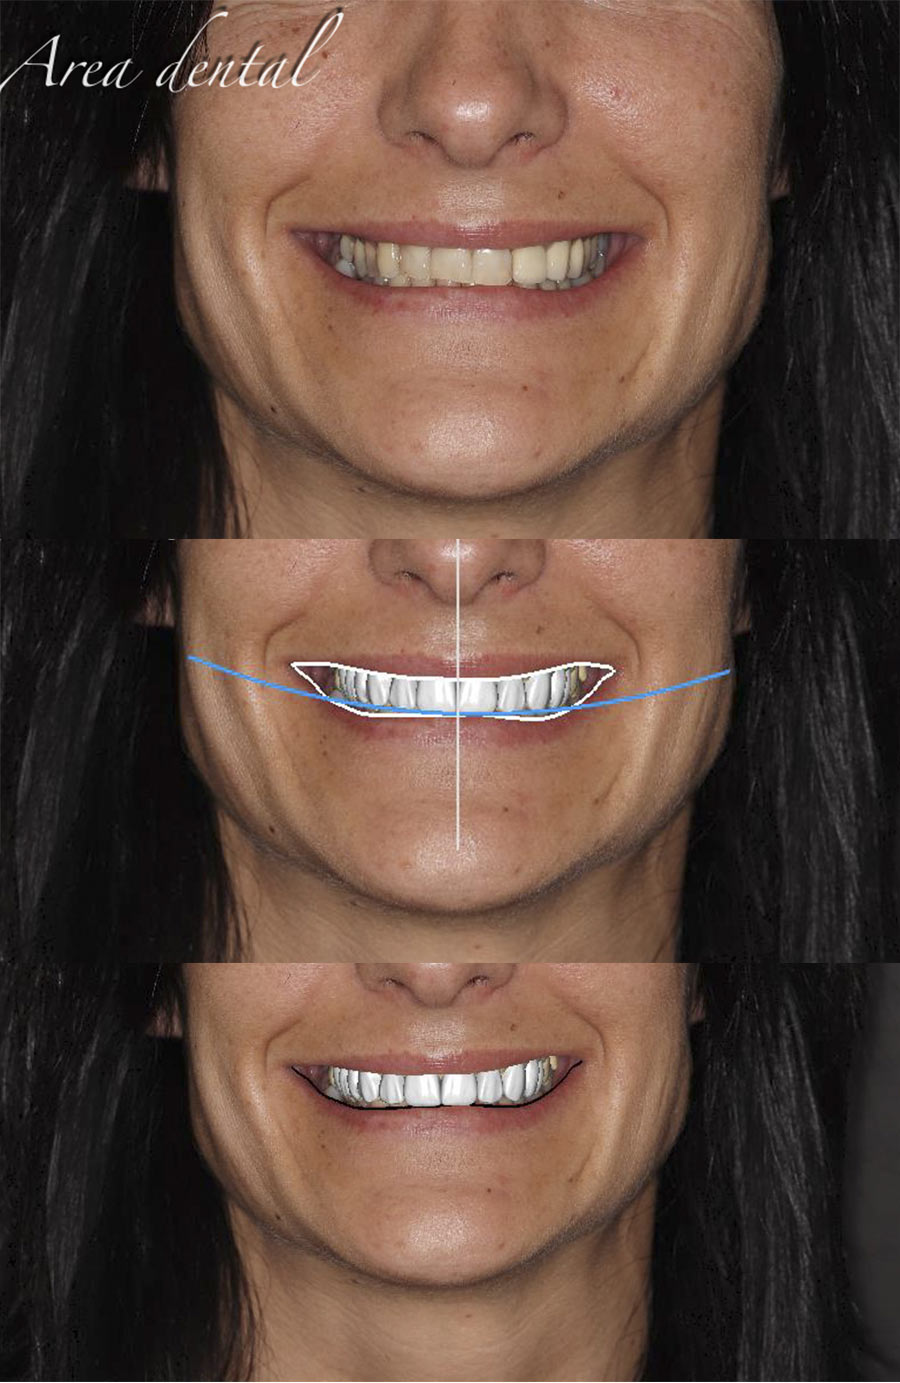 Diseño sonrisa digital